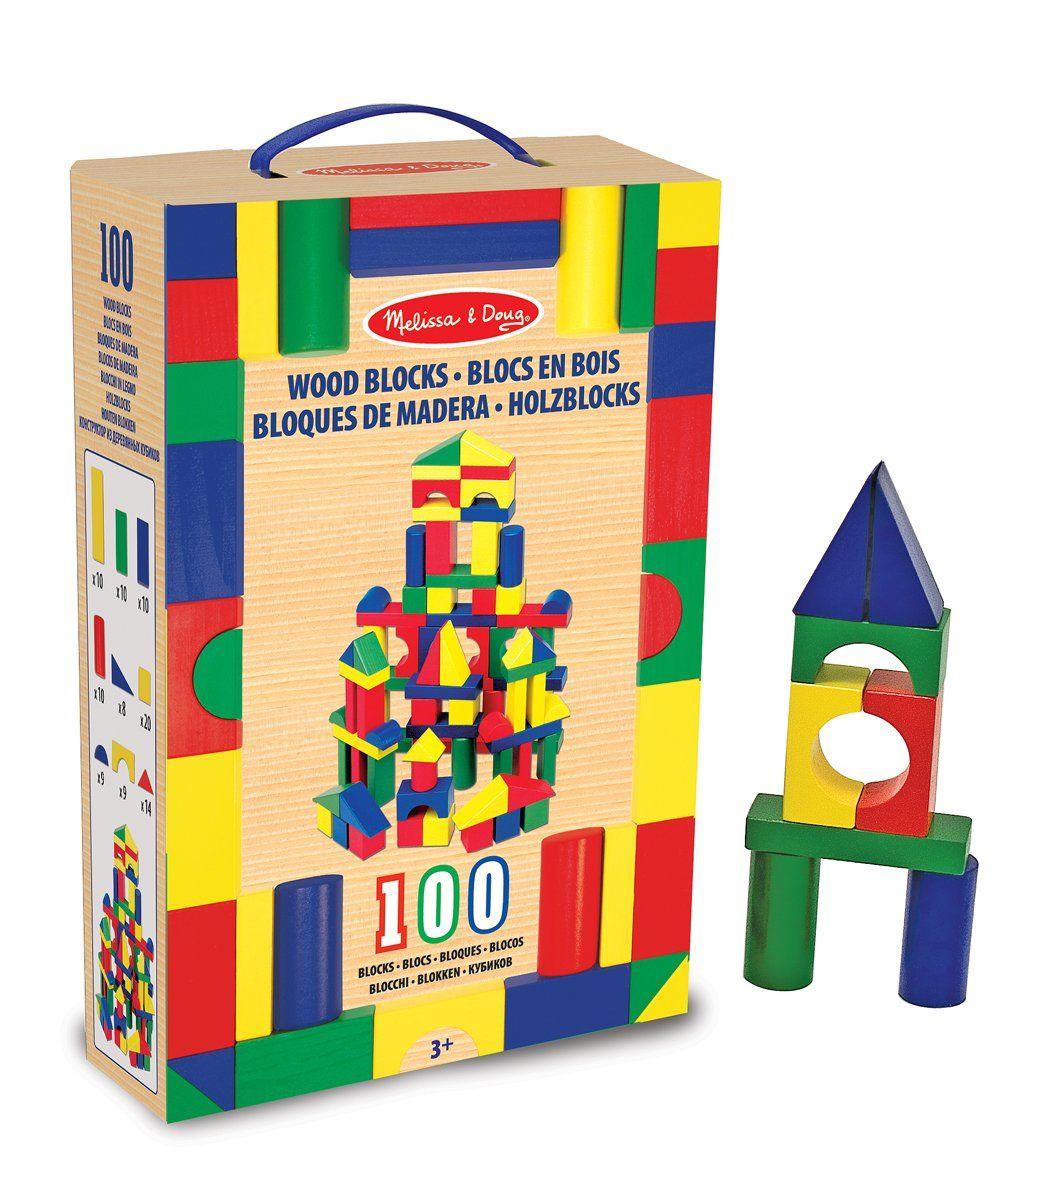 Melissa & Doug 100 Wood Building Blocks Set, Toys & Games